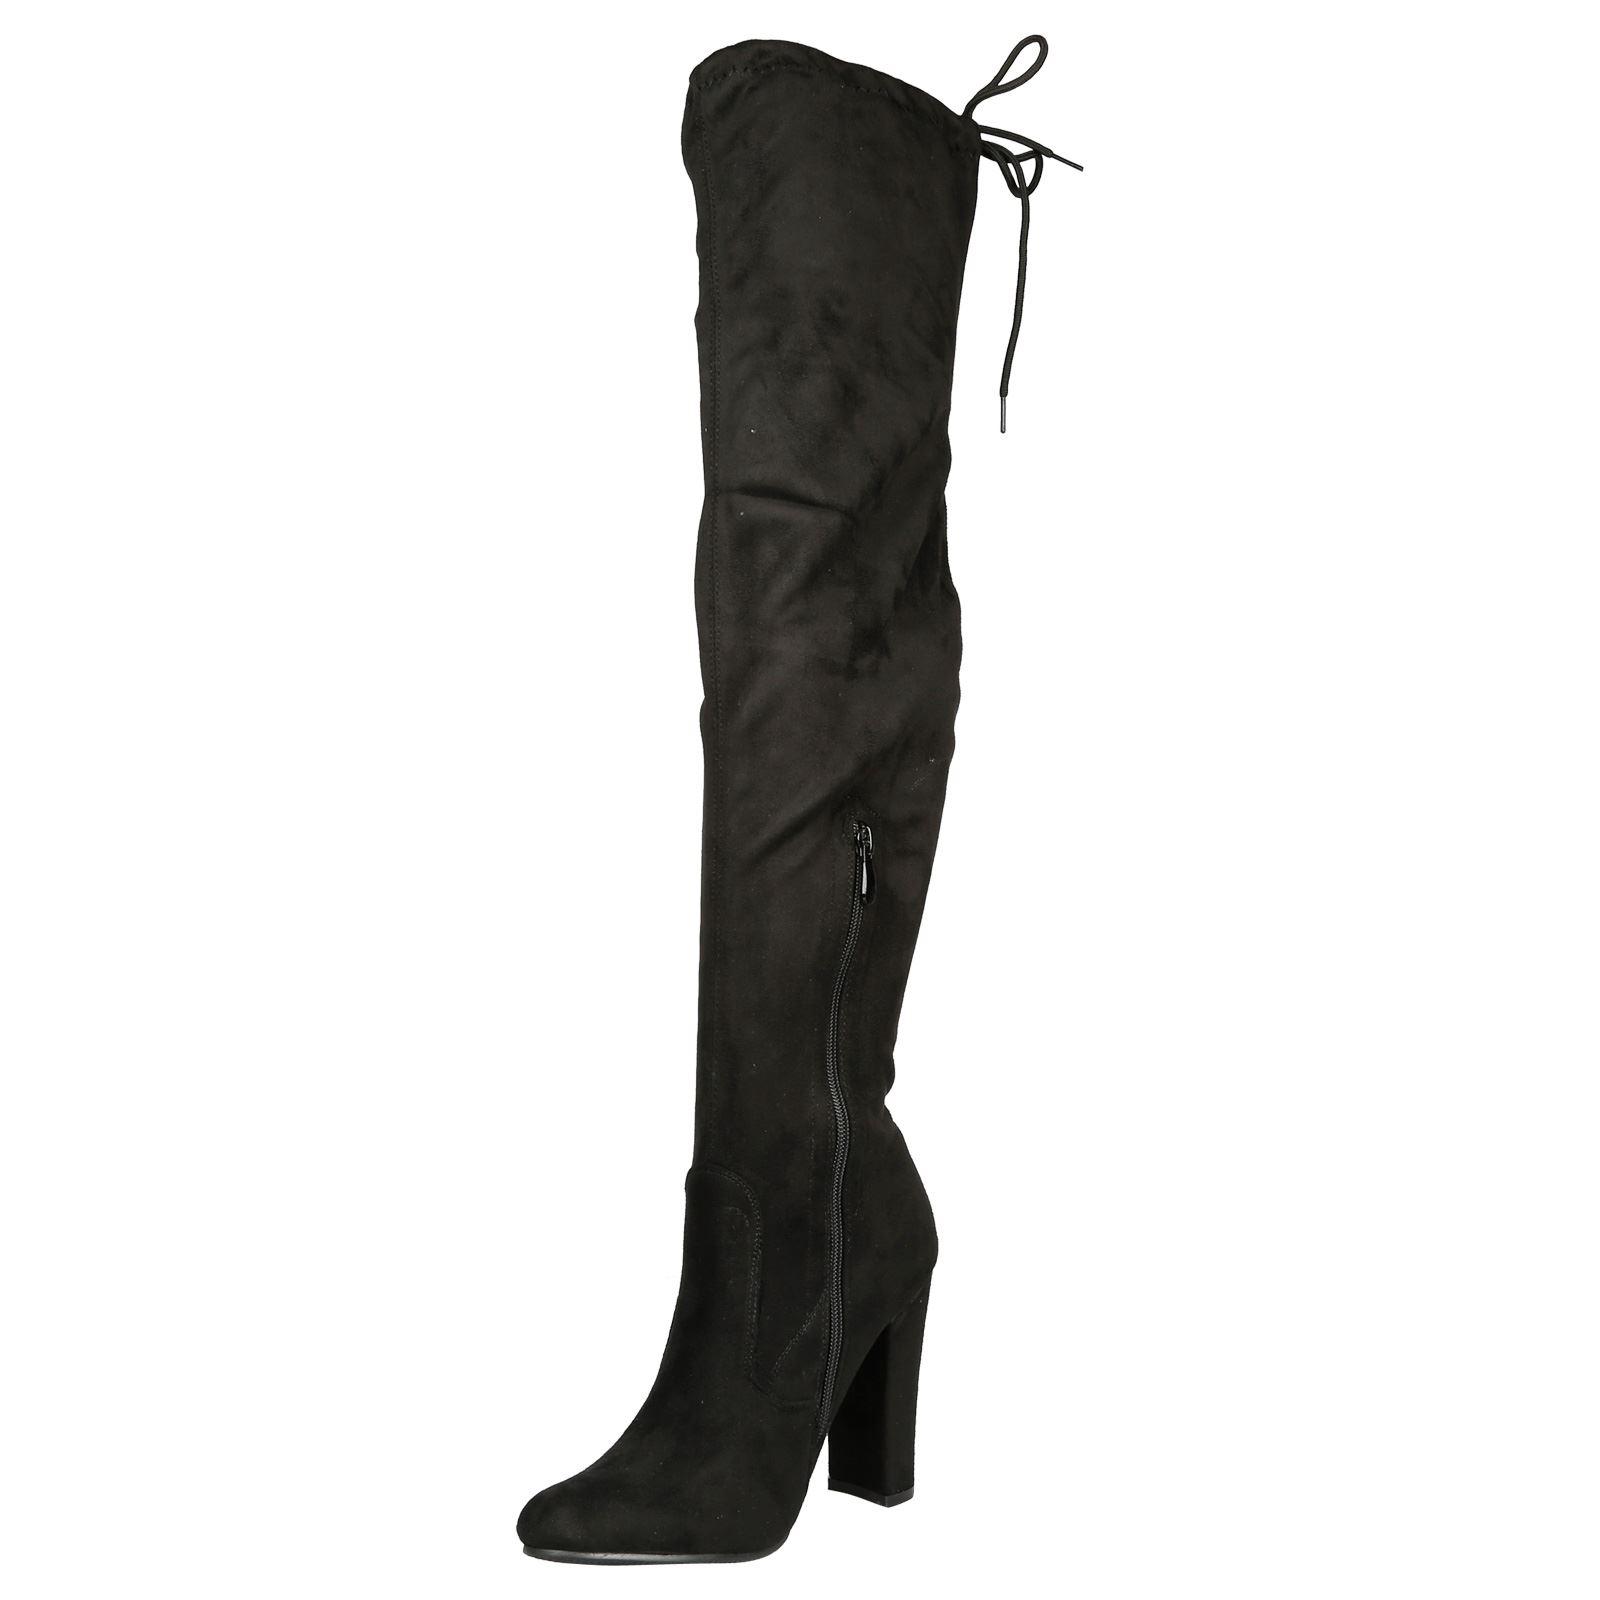 Iliana-Womens-Knee-High-Zip-Up-Adjustable-Pull-Strings-Mid-High-Block-Heel-Boots thumbnail 4